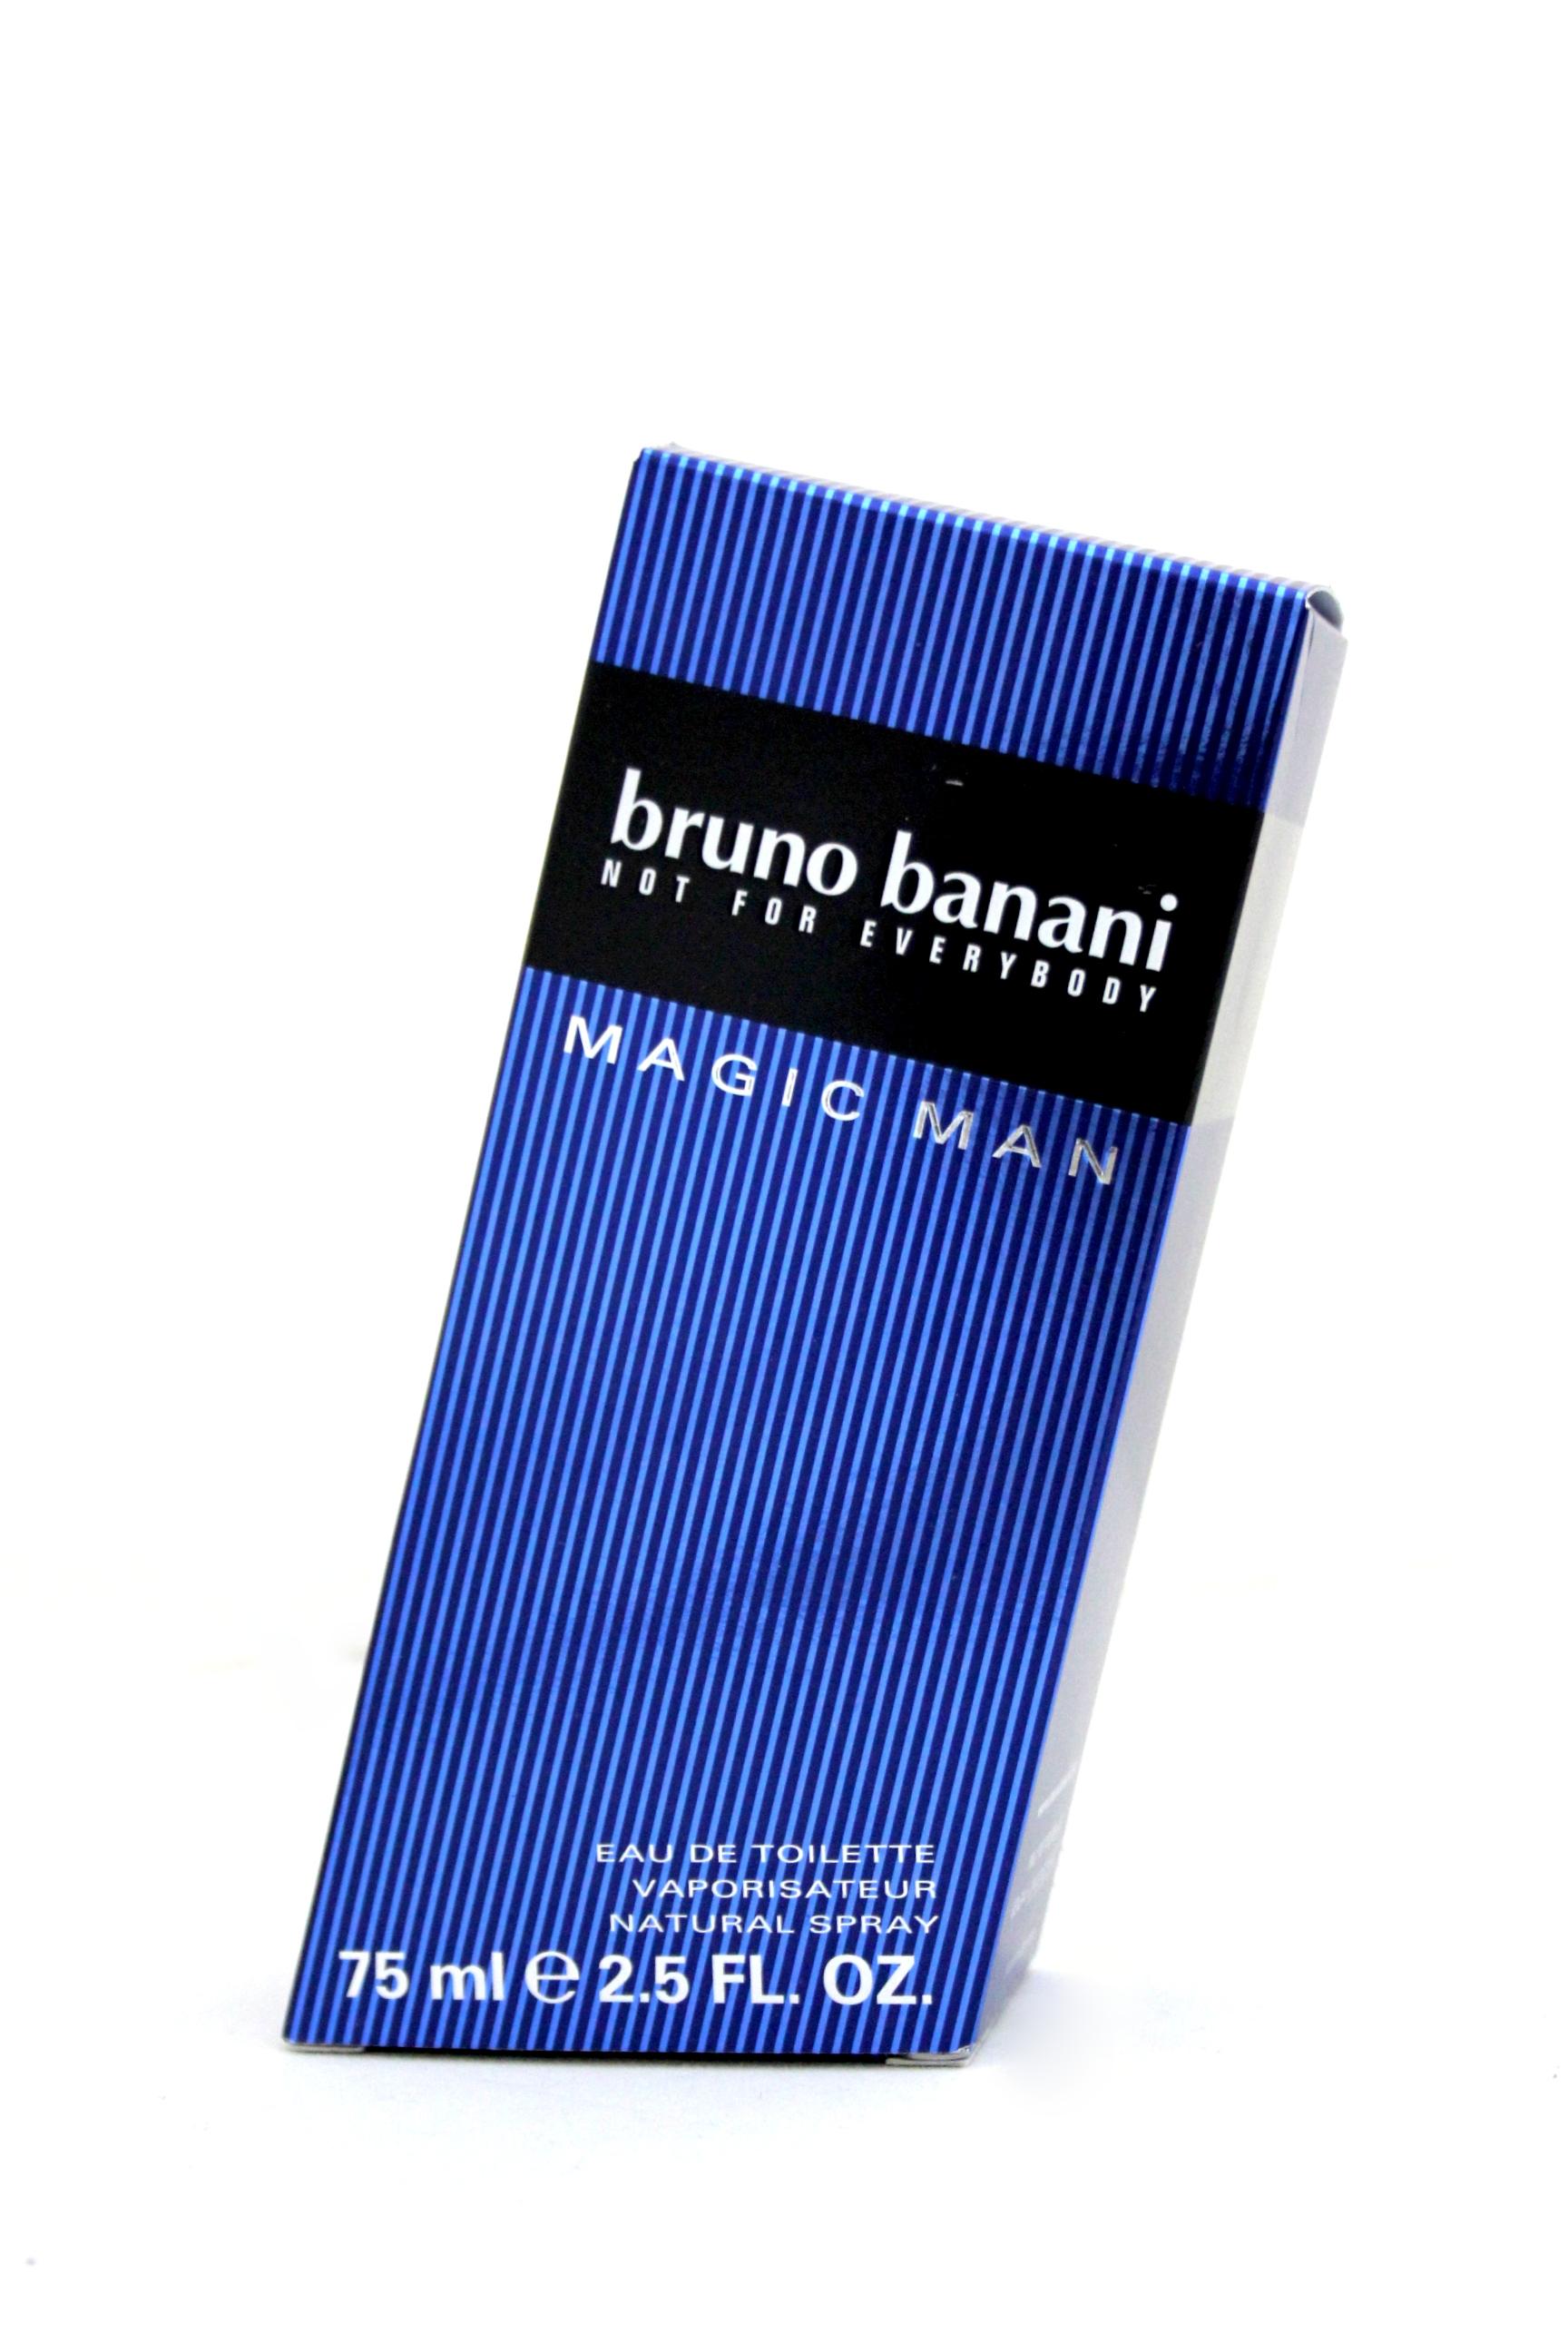 Bruno Banani Magic Man Eau De Toilette